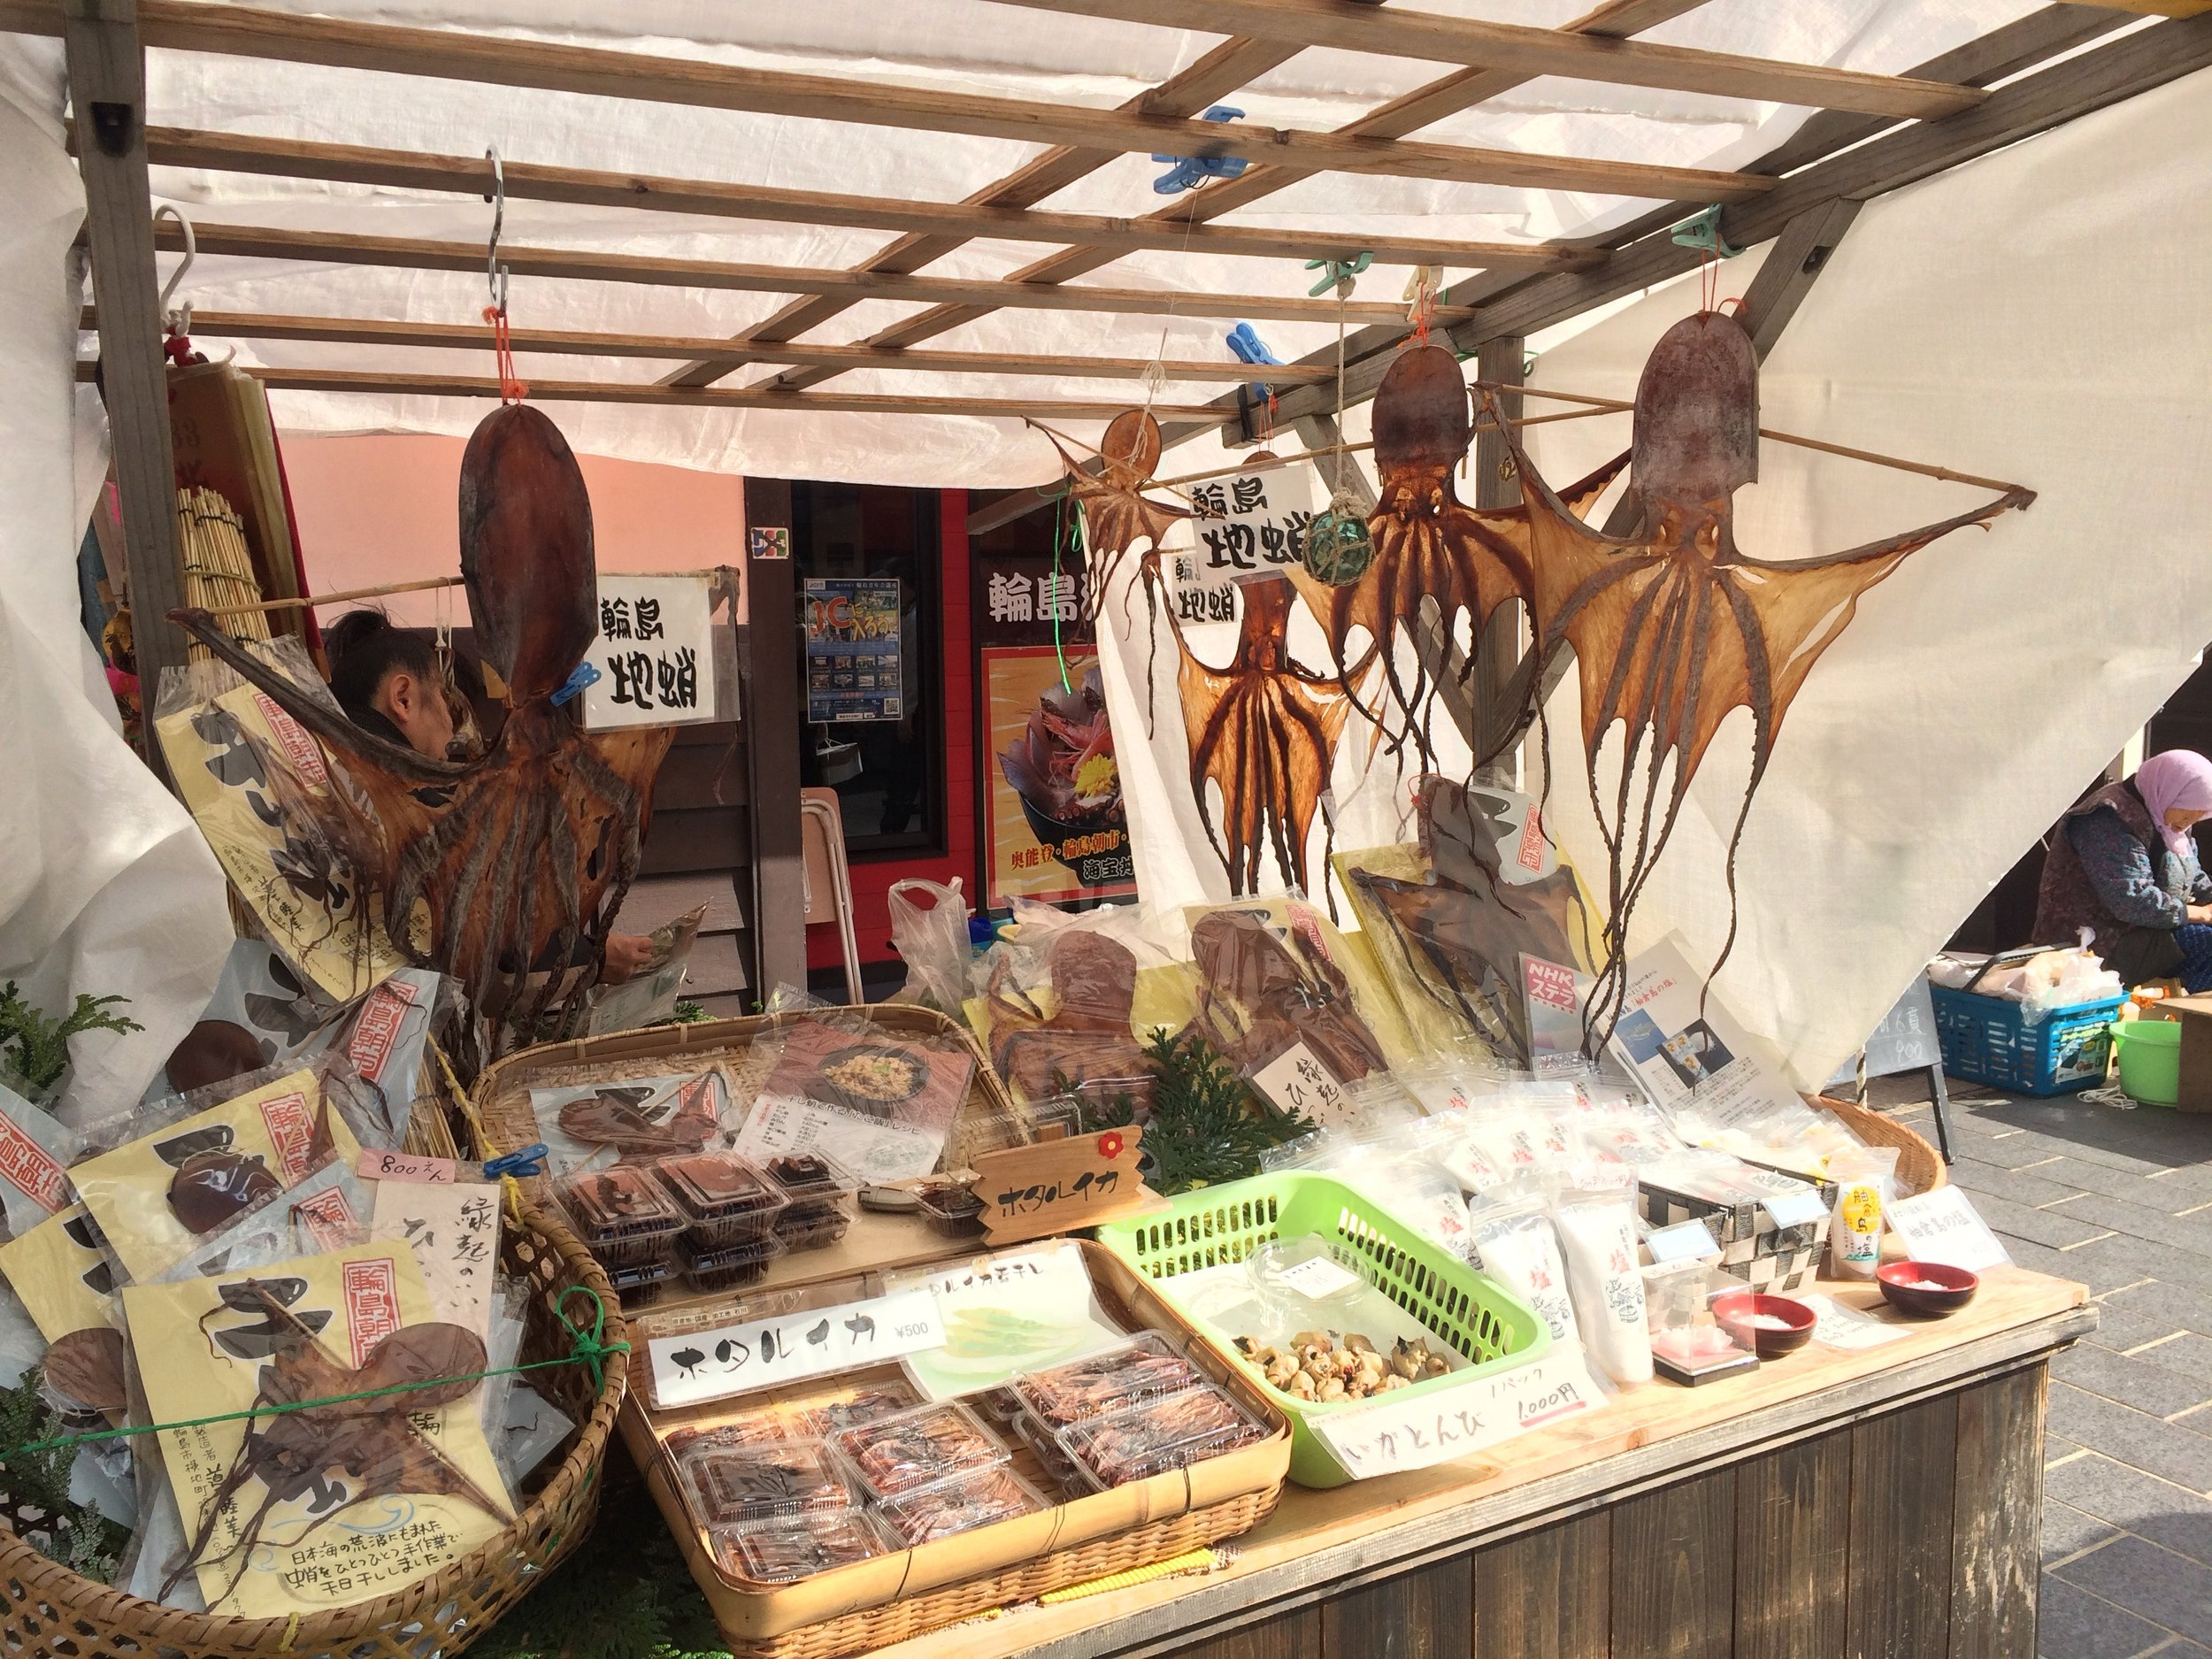 One of the many stalls with local produce at the Wajima Asaichi morning market.